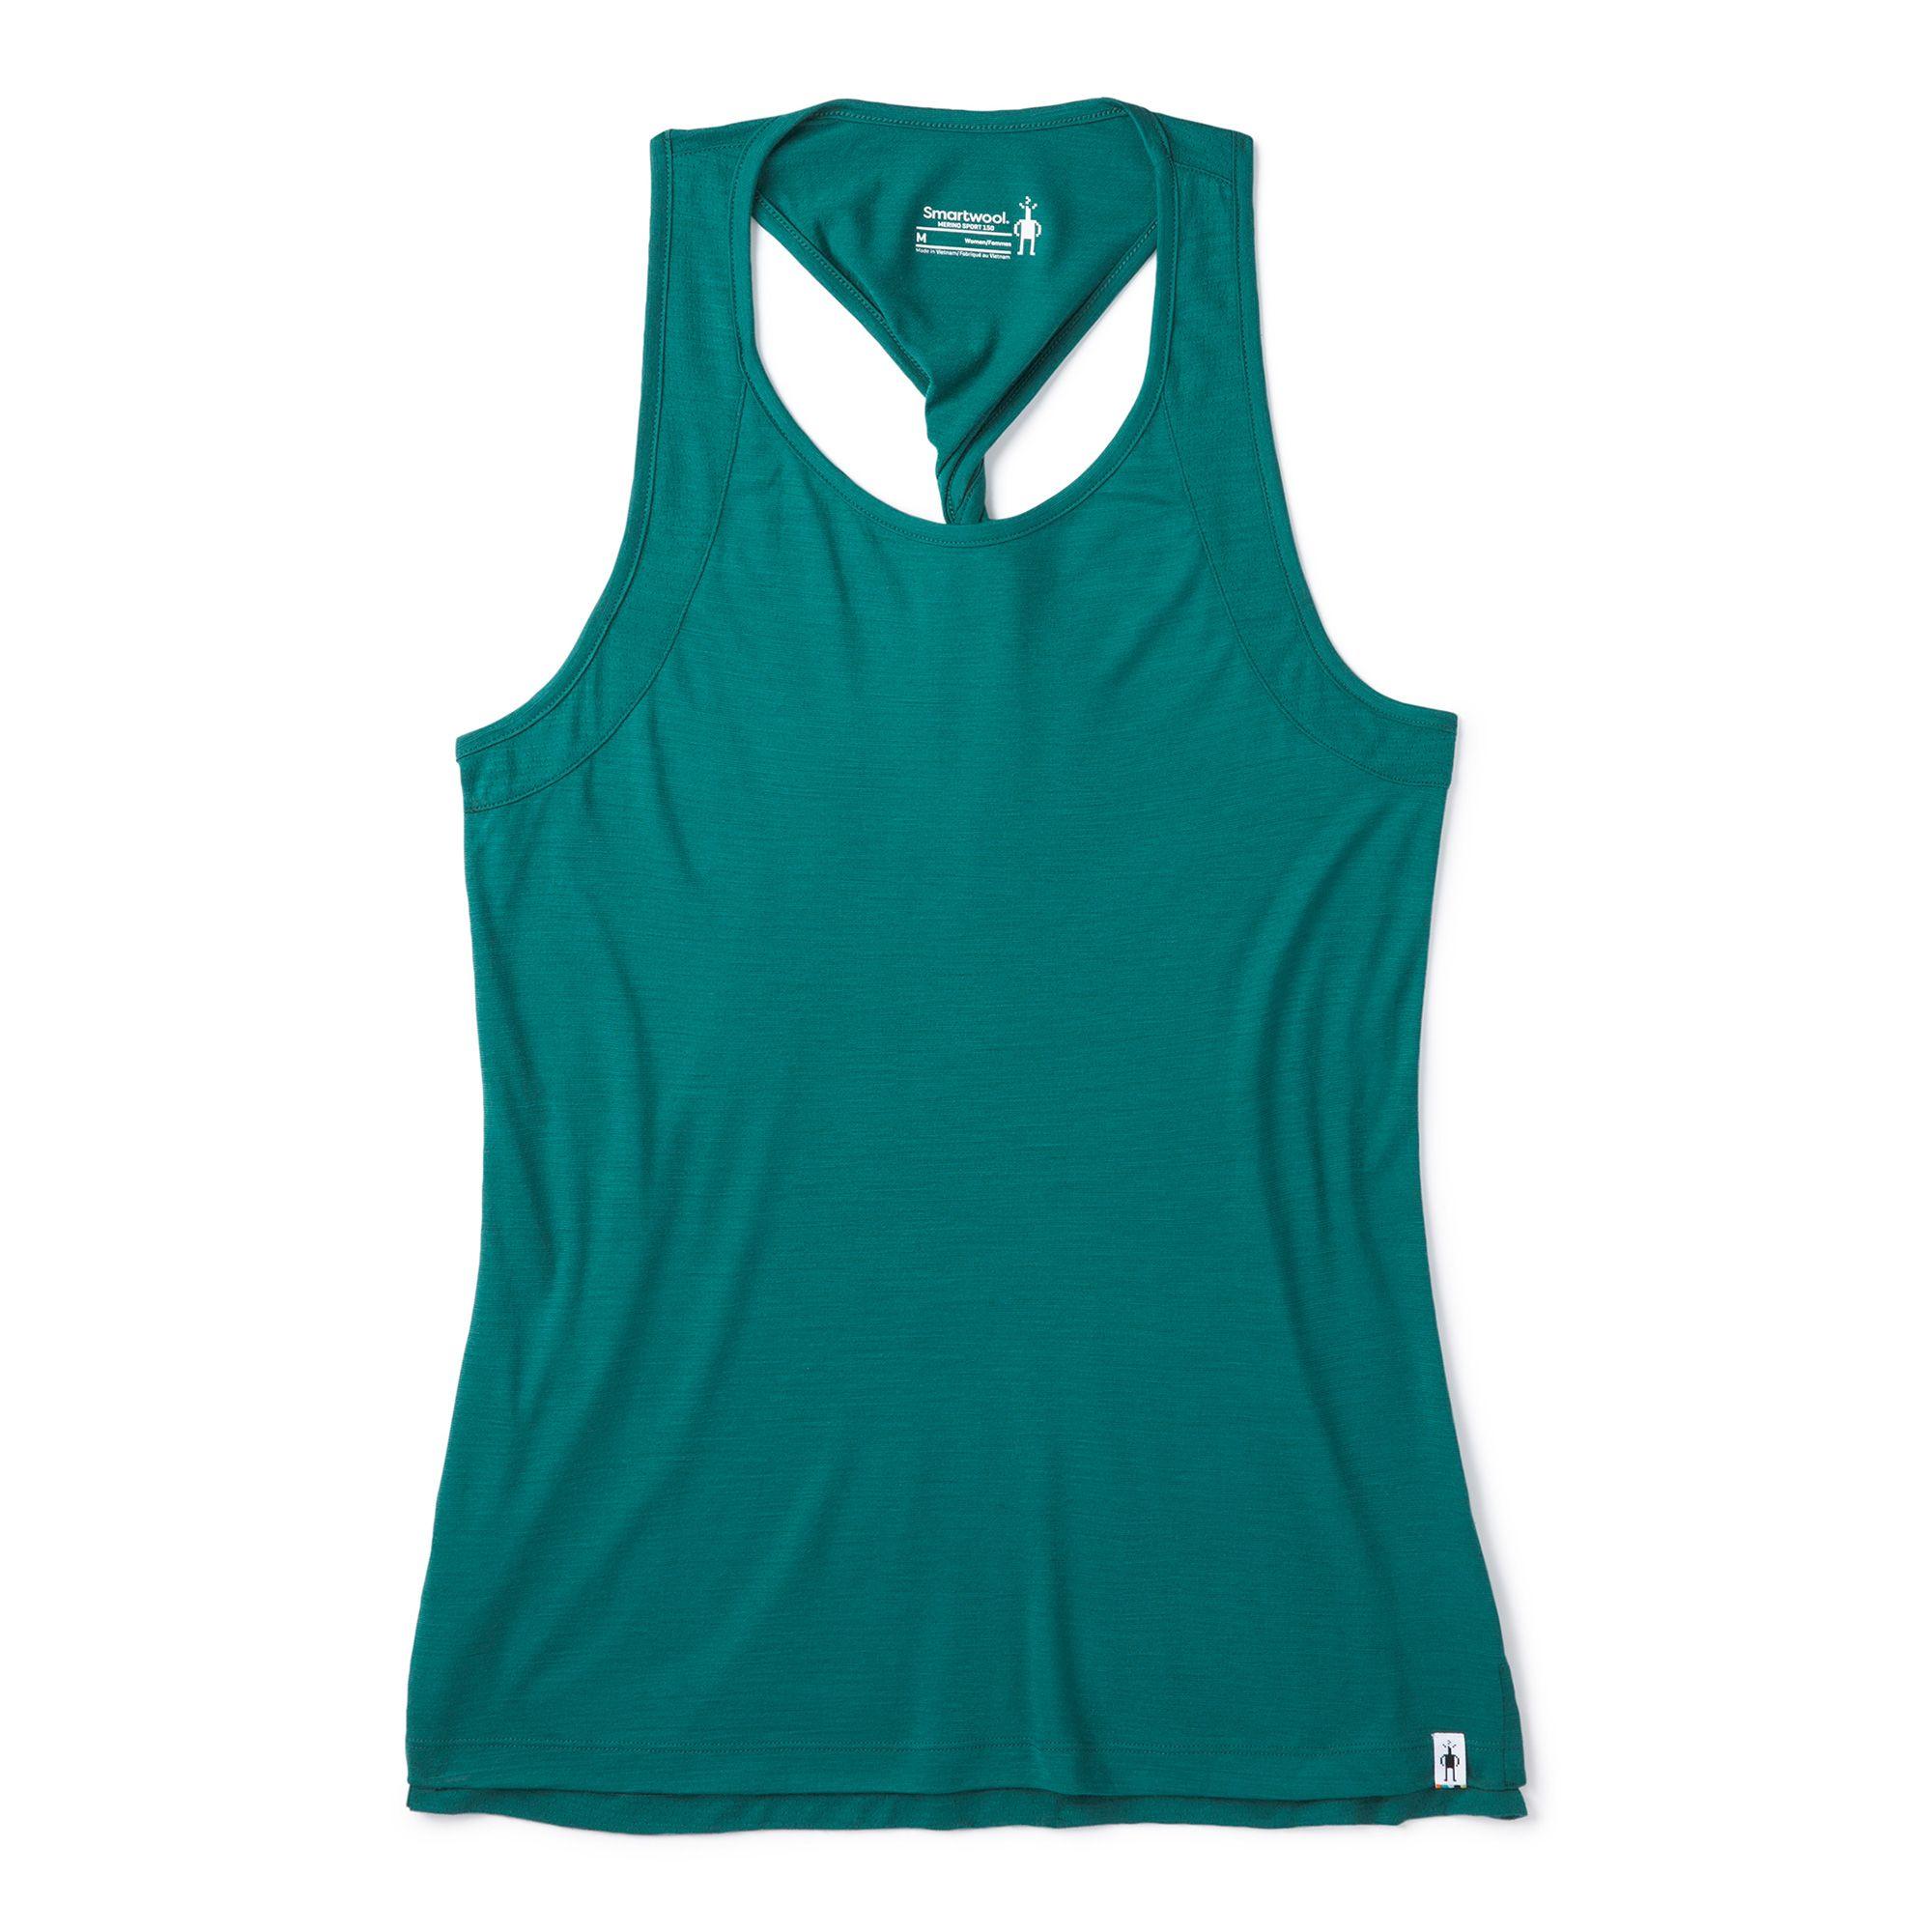 Camisole Merino Sport 150 pour femmes